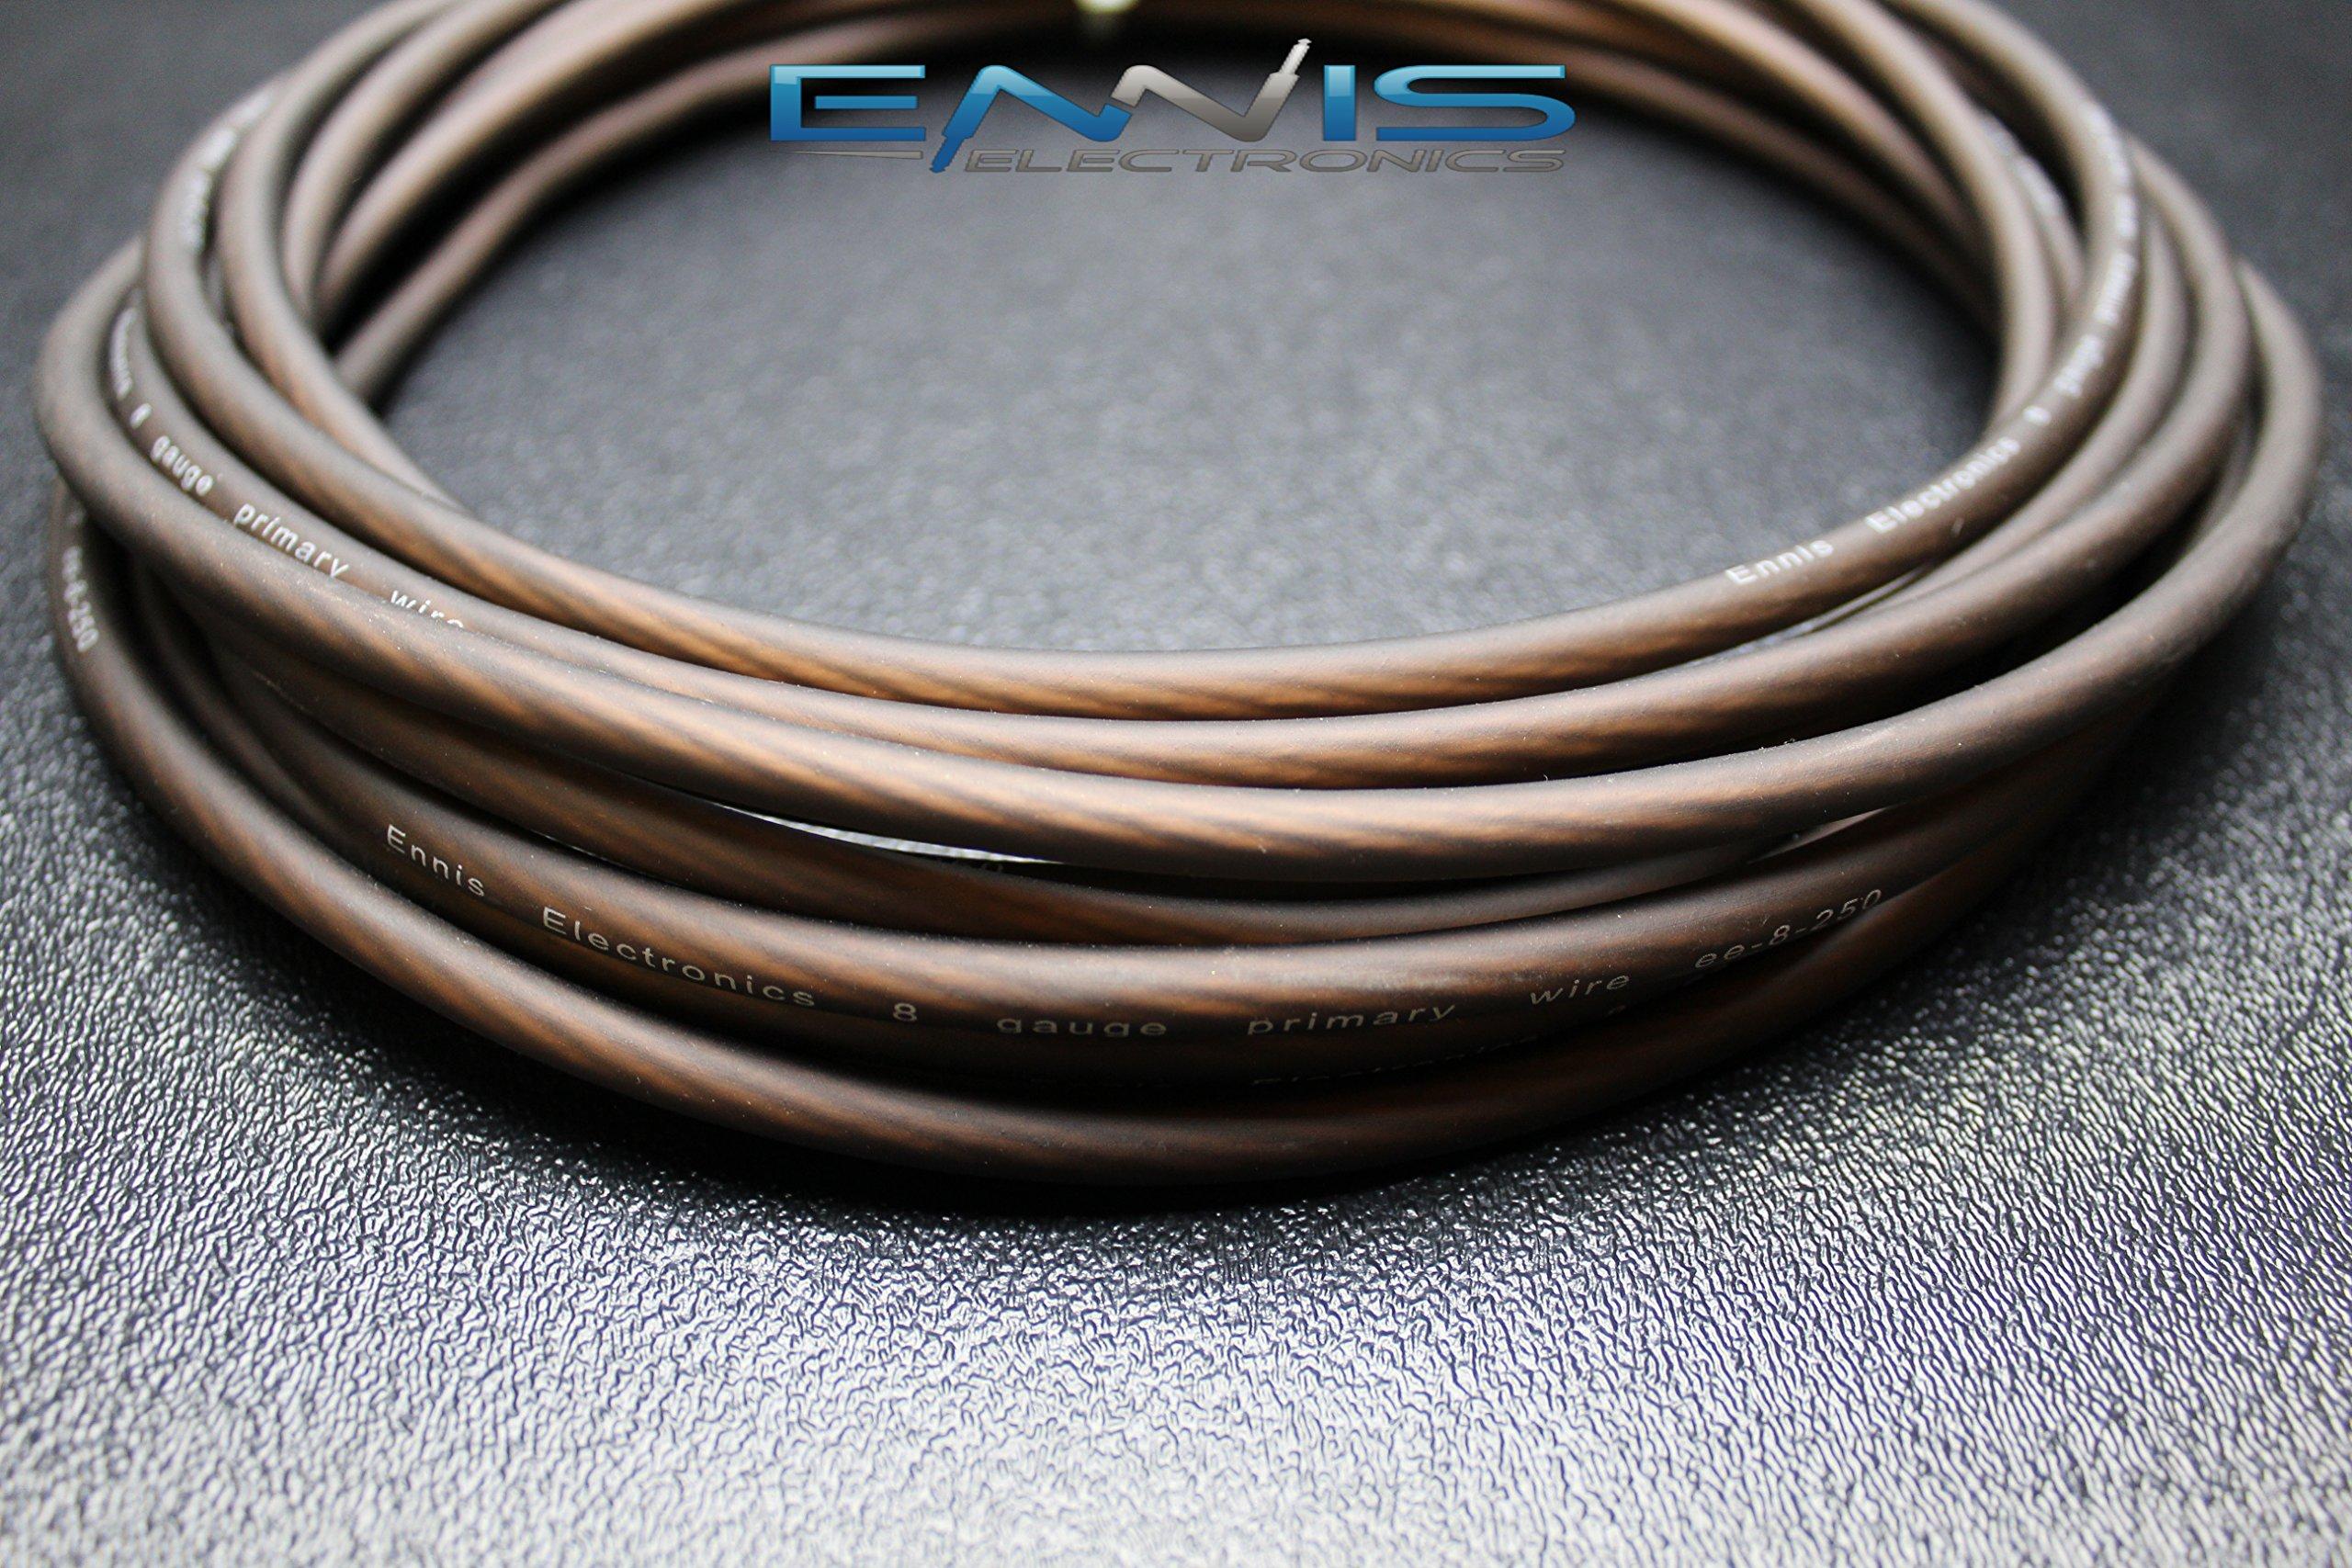 8 GAUGE WIRE 25 FT BLACK AWG MATT CABLE BY ENNIS ELECTRONICS SUPER FLEX POWER GROUND STRANDED CAR SOLAR AUTOMOTIVE